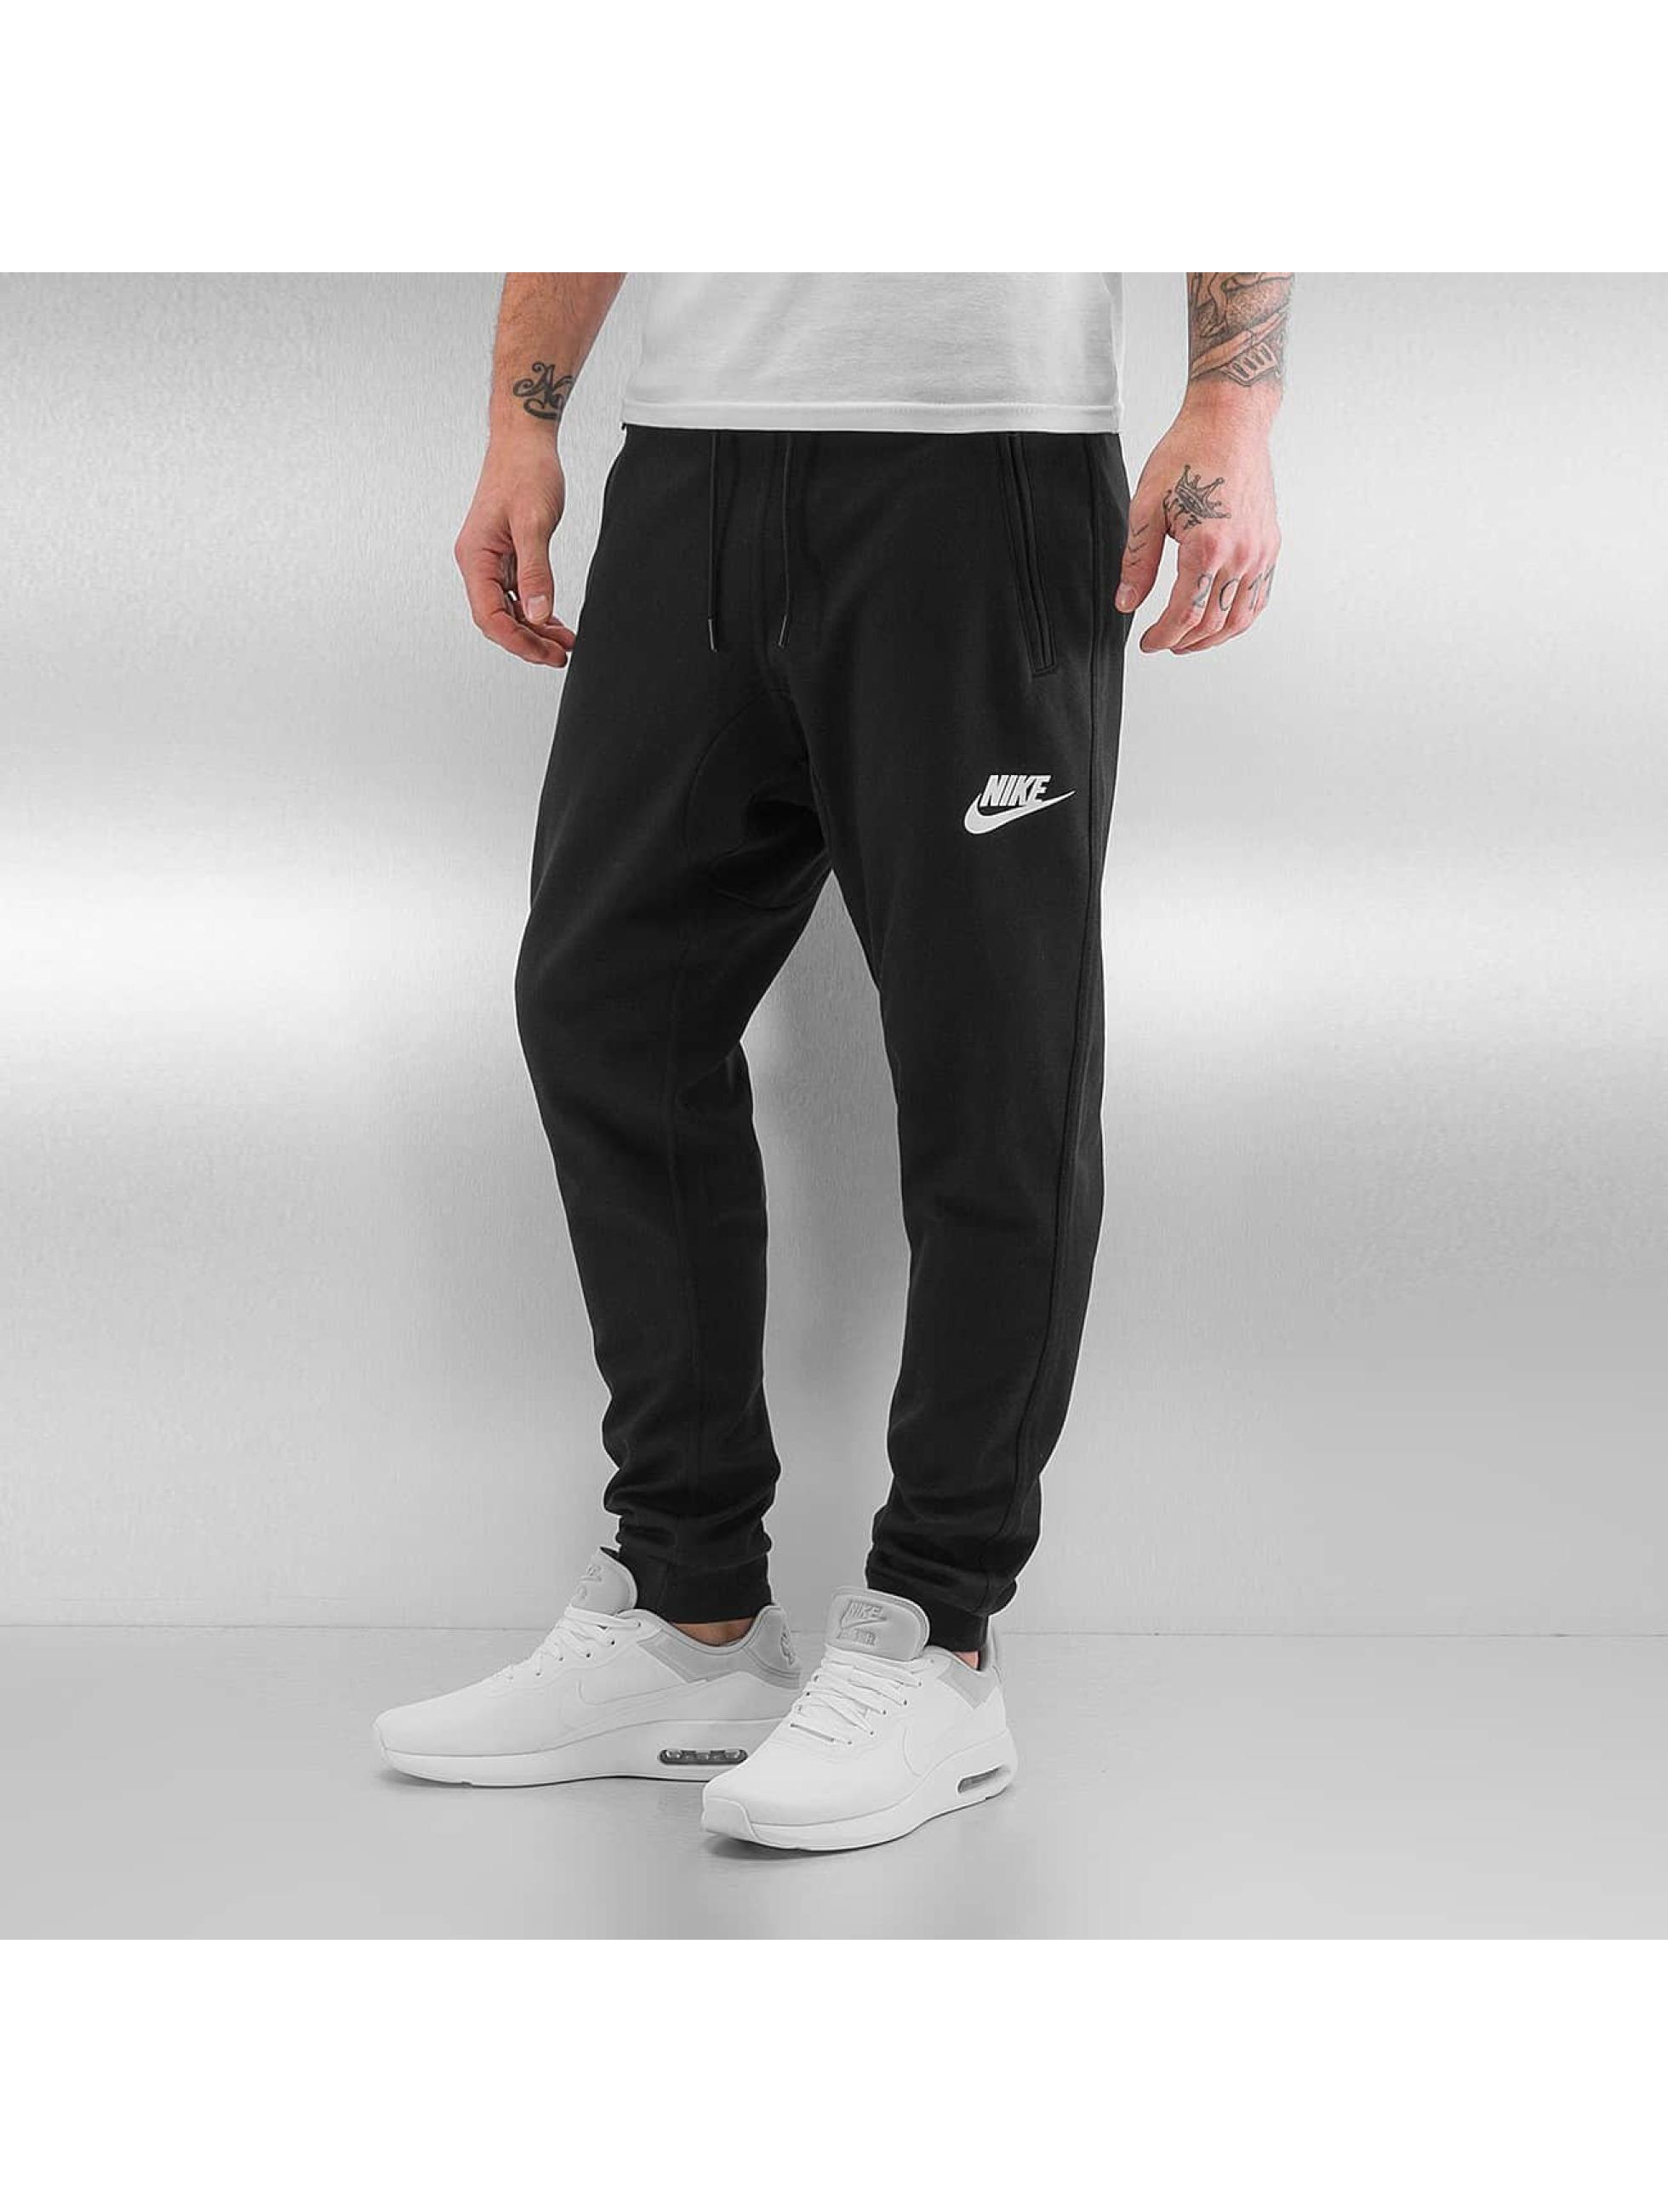 nike herren jogginghose sportswear advance 15 in schwarz. Black Bedroom Furniture Sets. Home Design Ideas